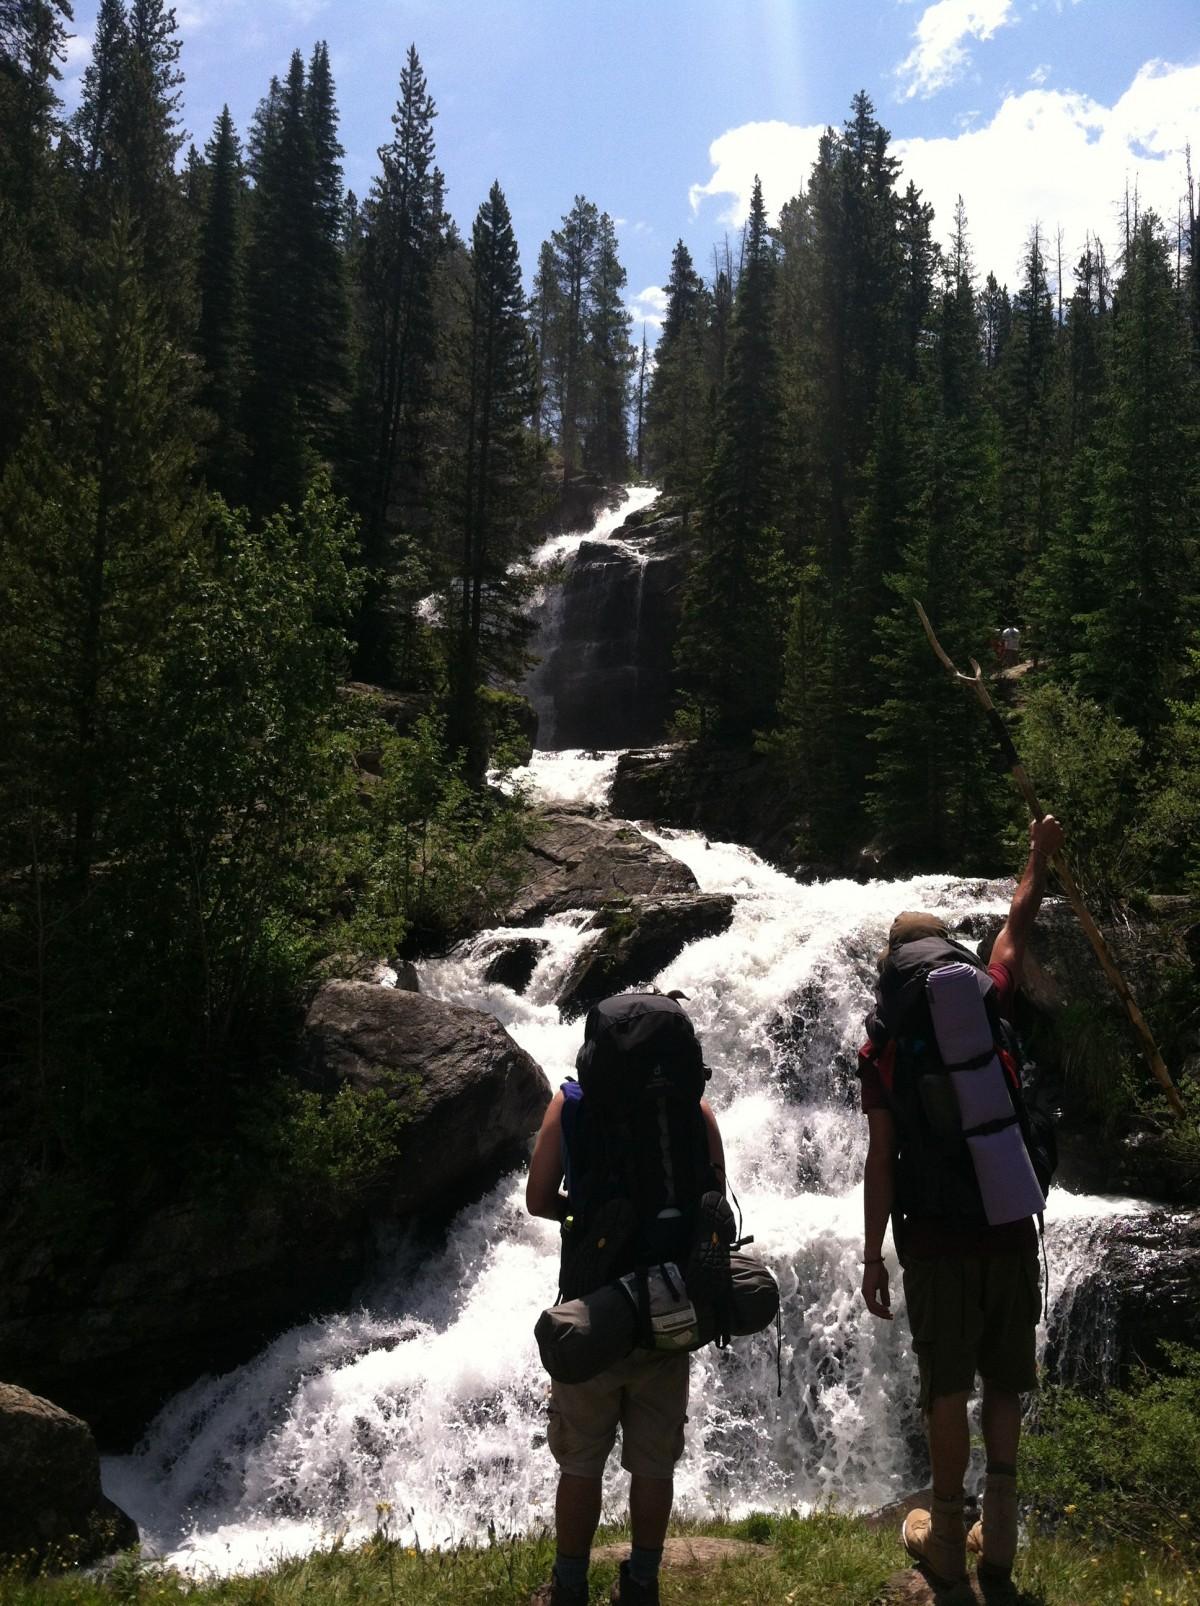 Free Images  walking mountain hiking trail adventure backpack hike ridge spain sports